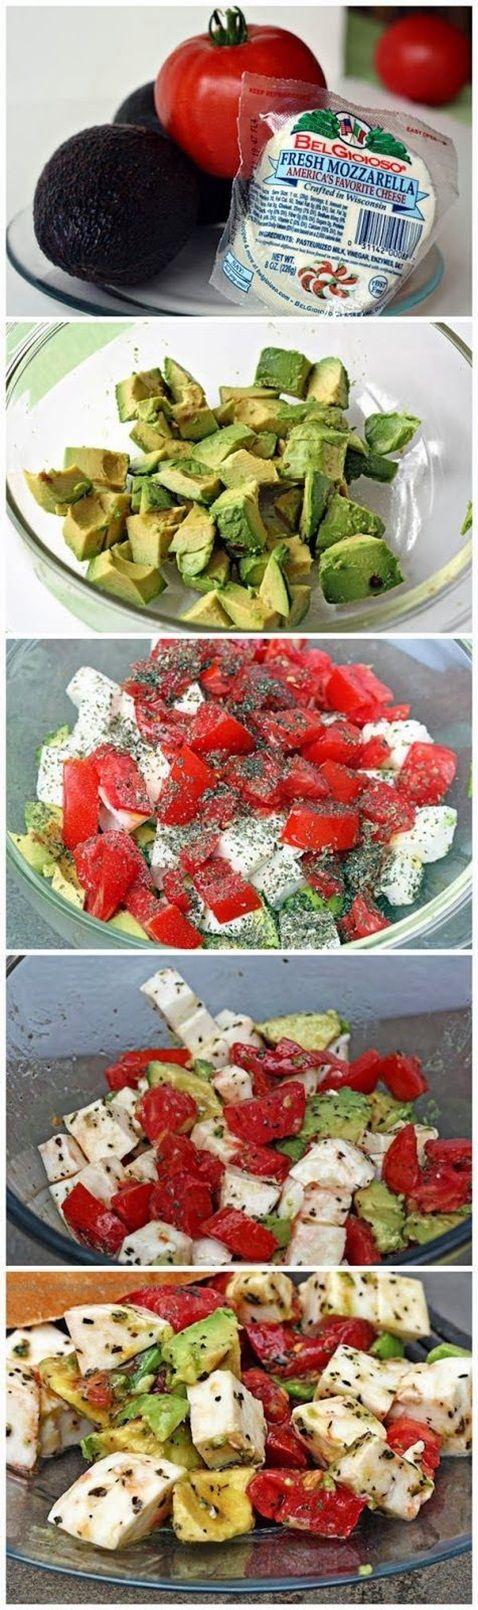 Mozzarella Avocado Tomato Salad